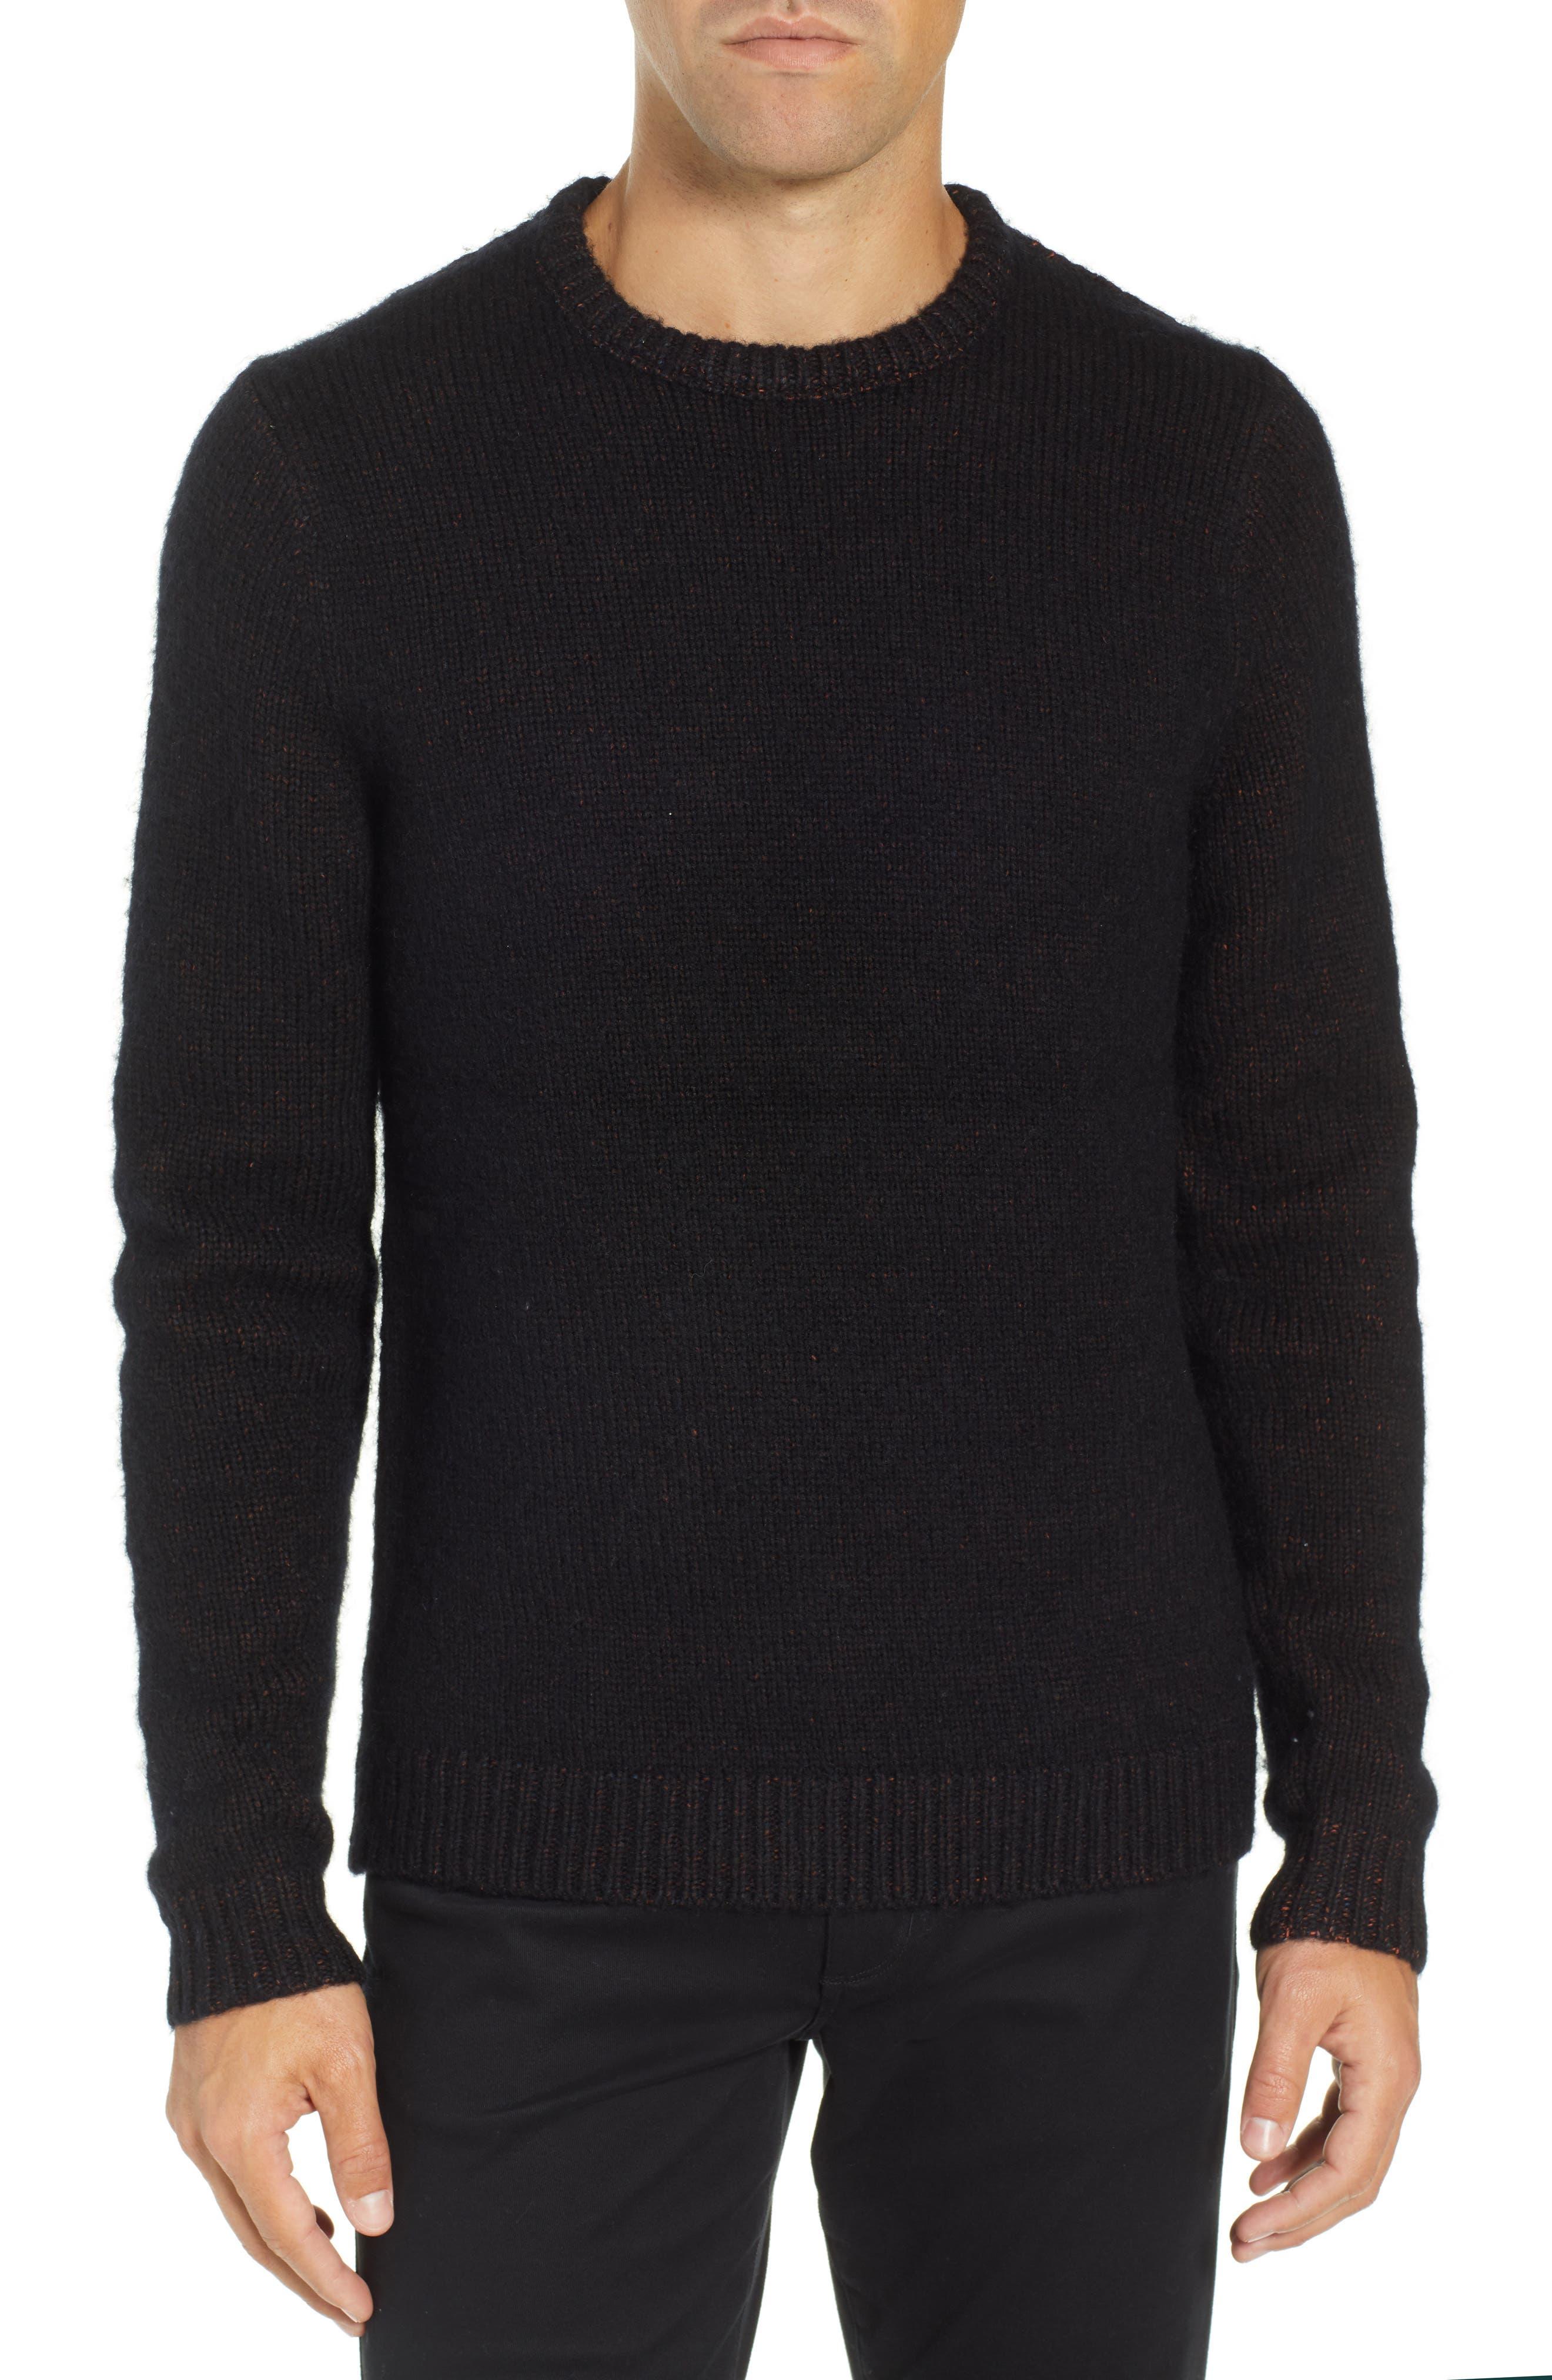 Chunky Crewneck Sweater,                             Main thumbnail 1, color,                             BLACK CAVIAR TWIST